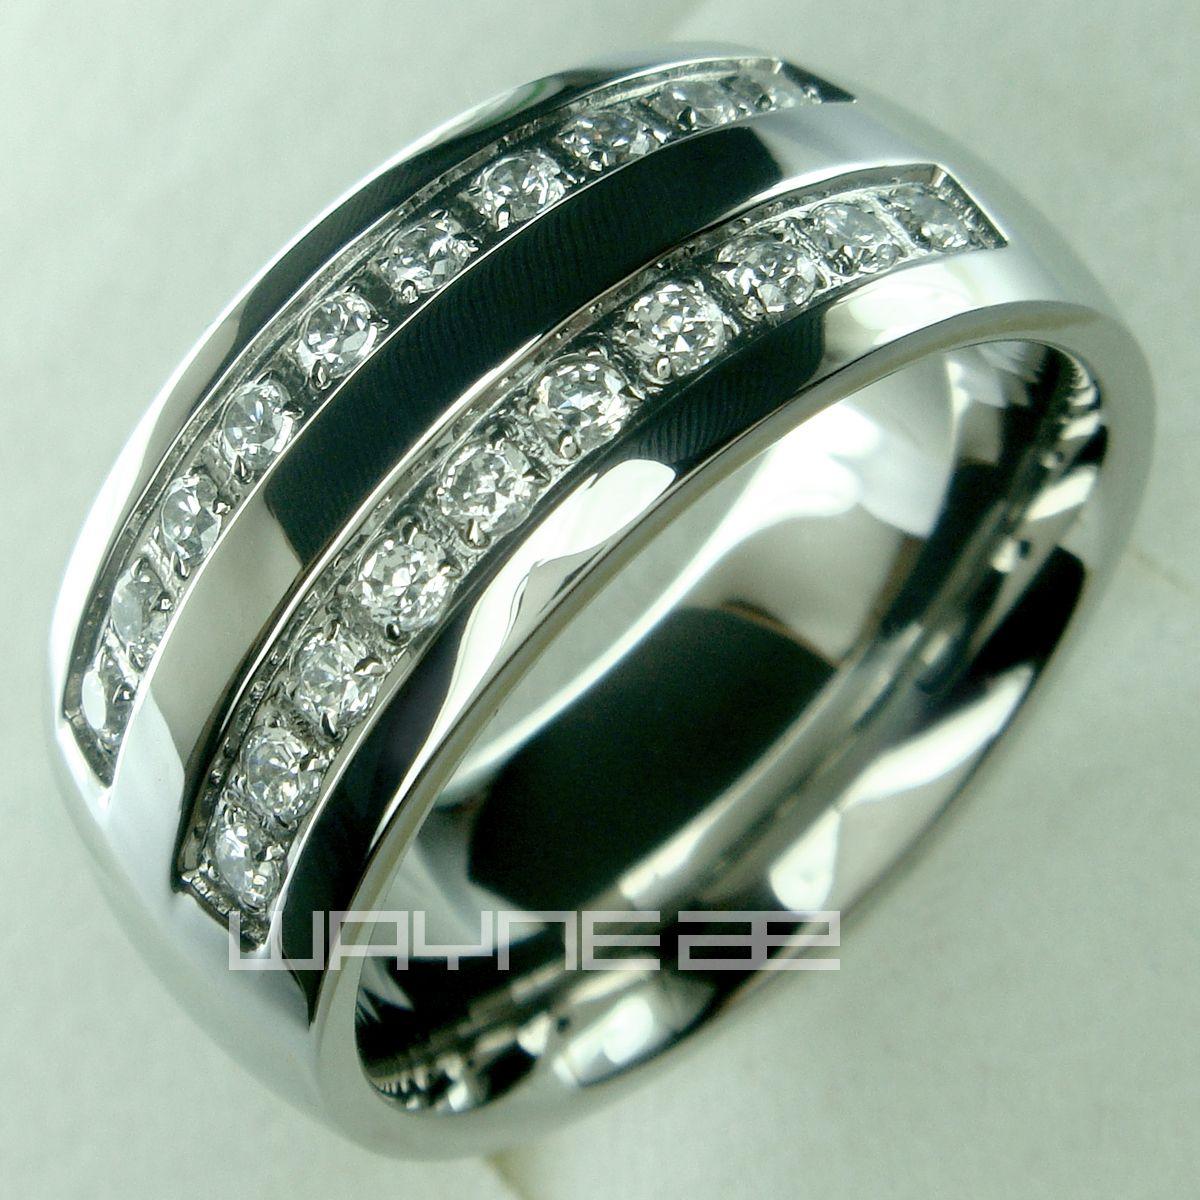 Roestvrij staal CZ bruiloft verlovingsring band R178A maat 8-15